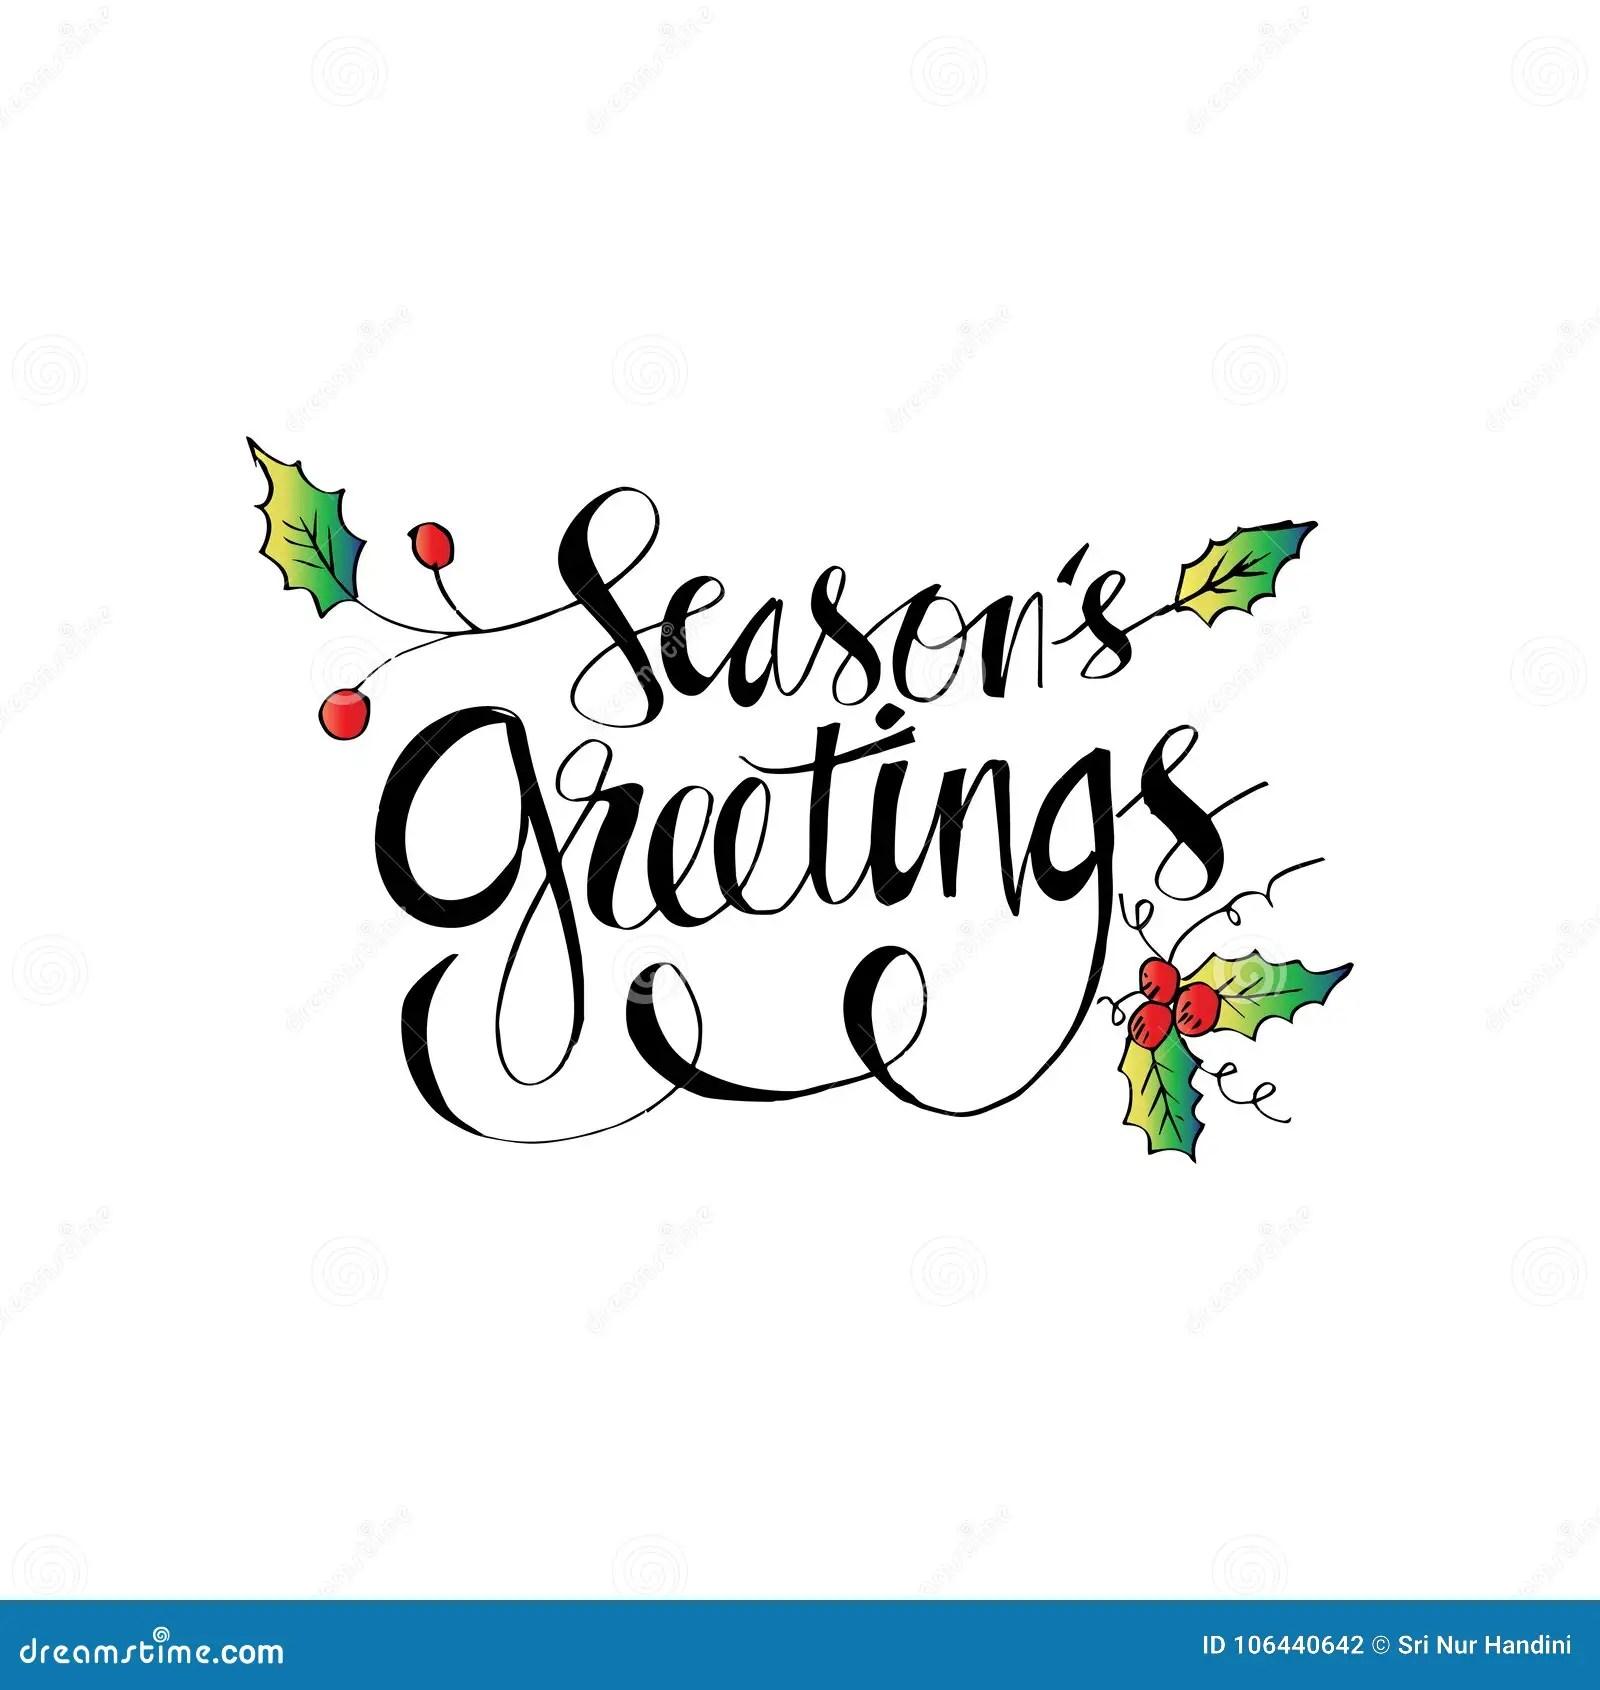 Seasons Greetings Hand Written Lettering Stock